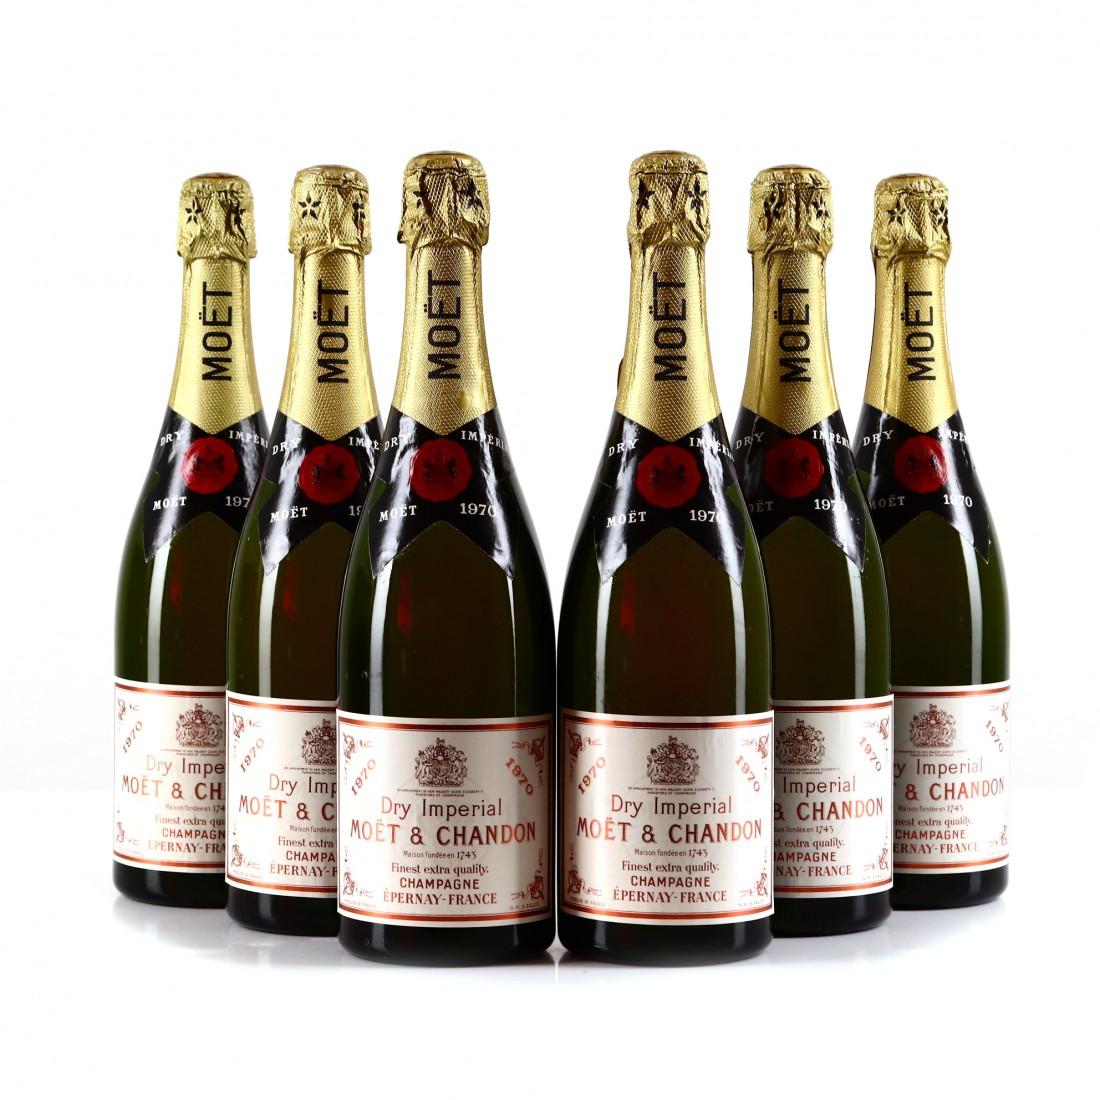 Moet & Chandon Dry Imperial Brut 1970 Vintage Champagne 6x75cl